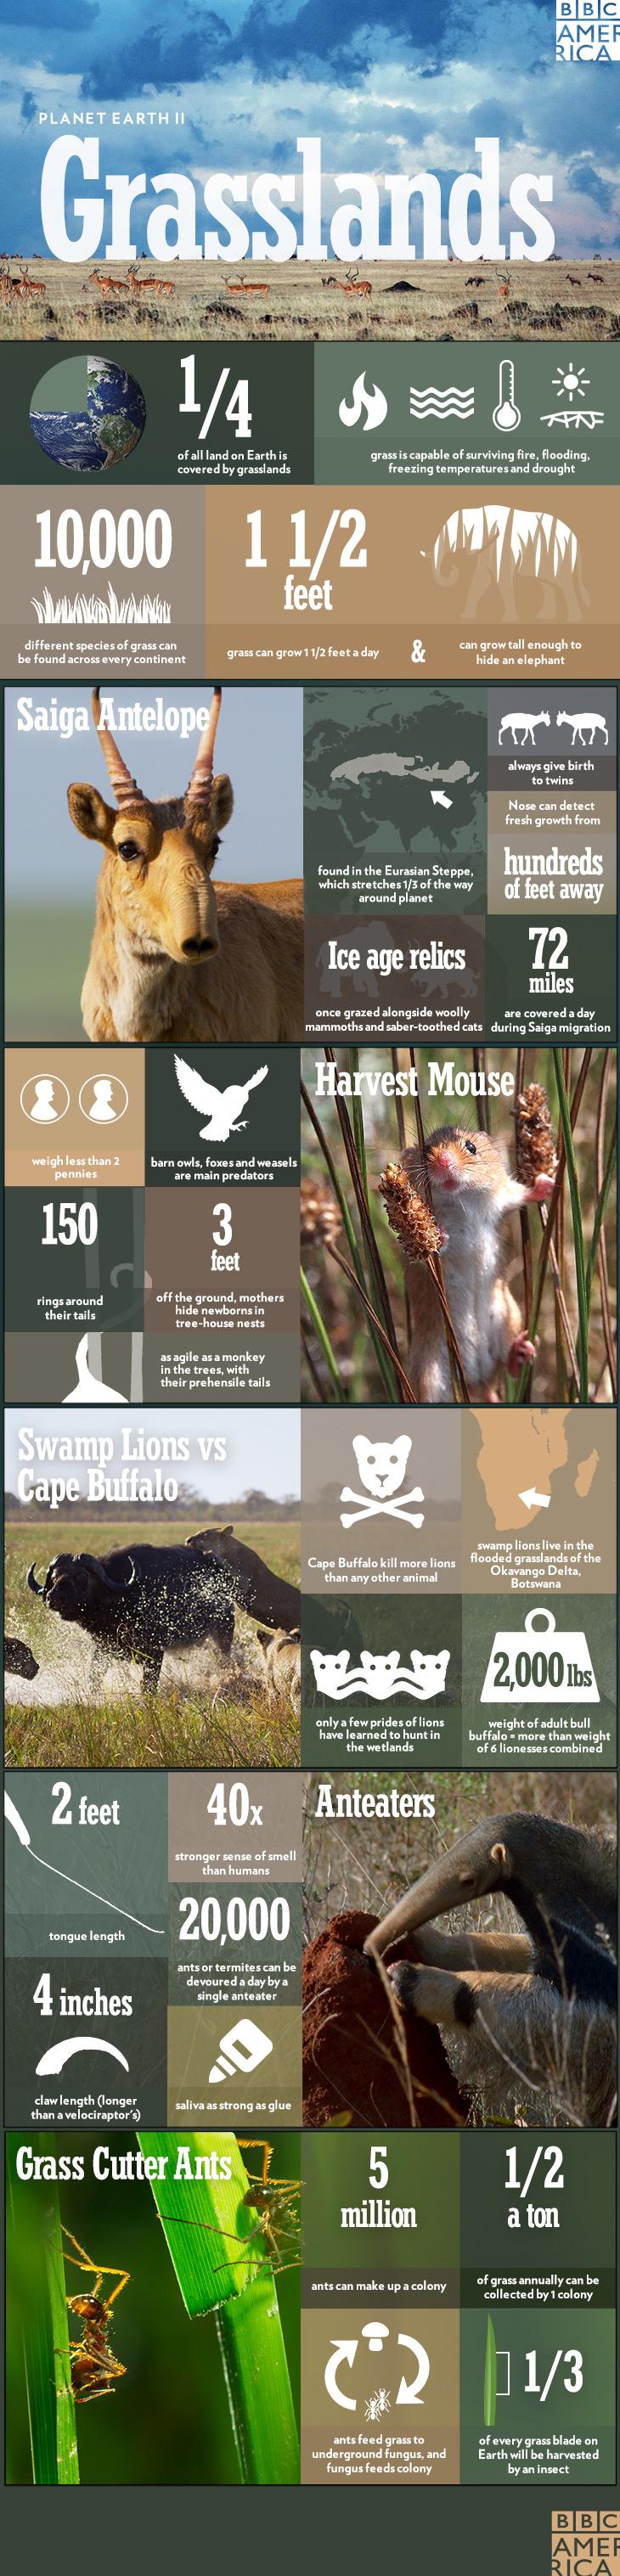 PEII_infographic_grasslands_1